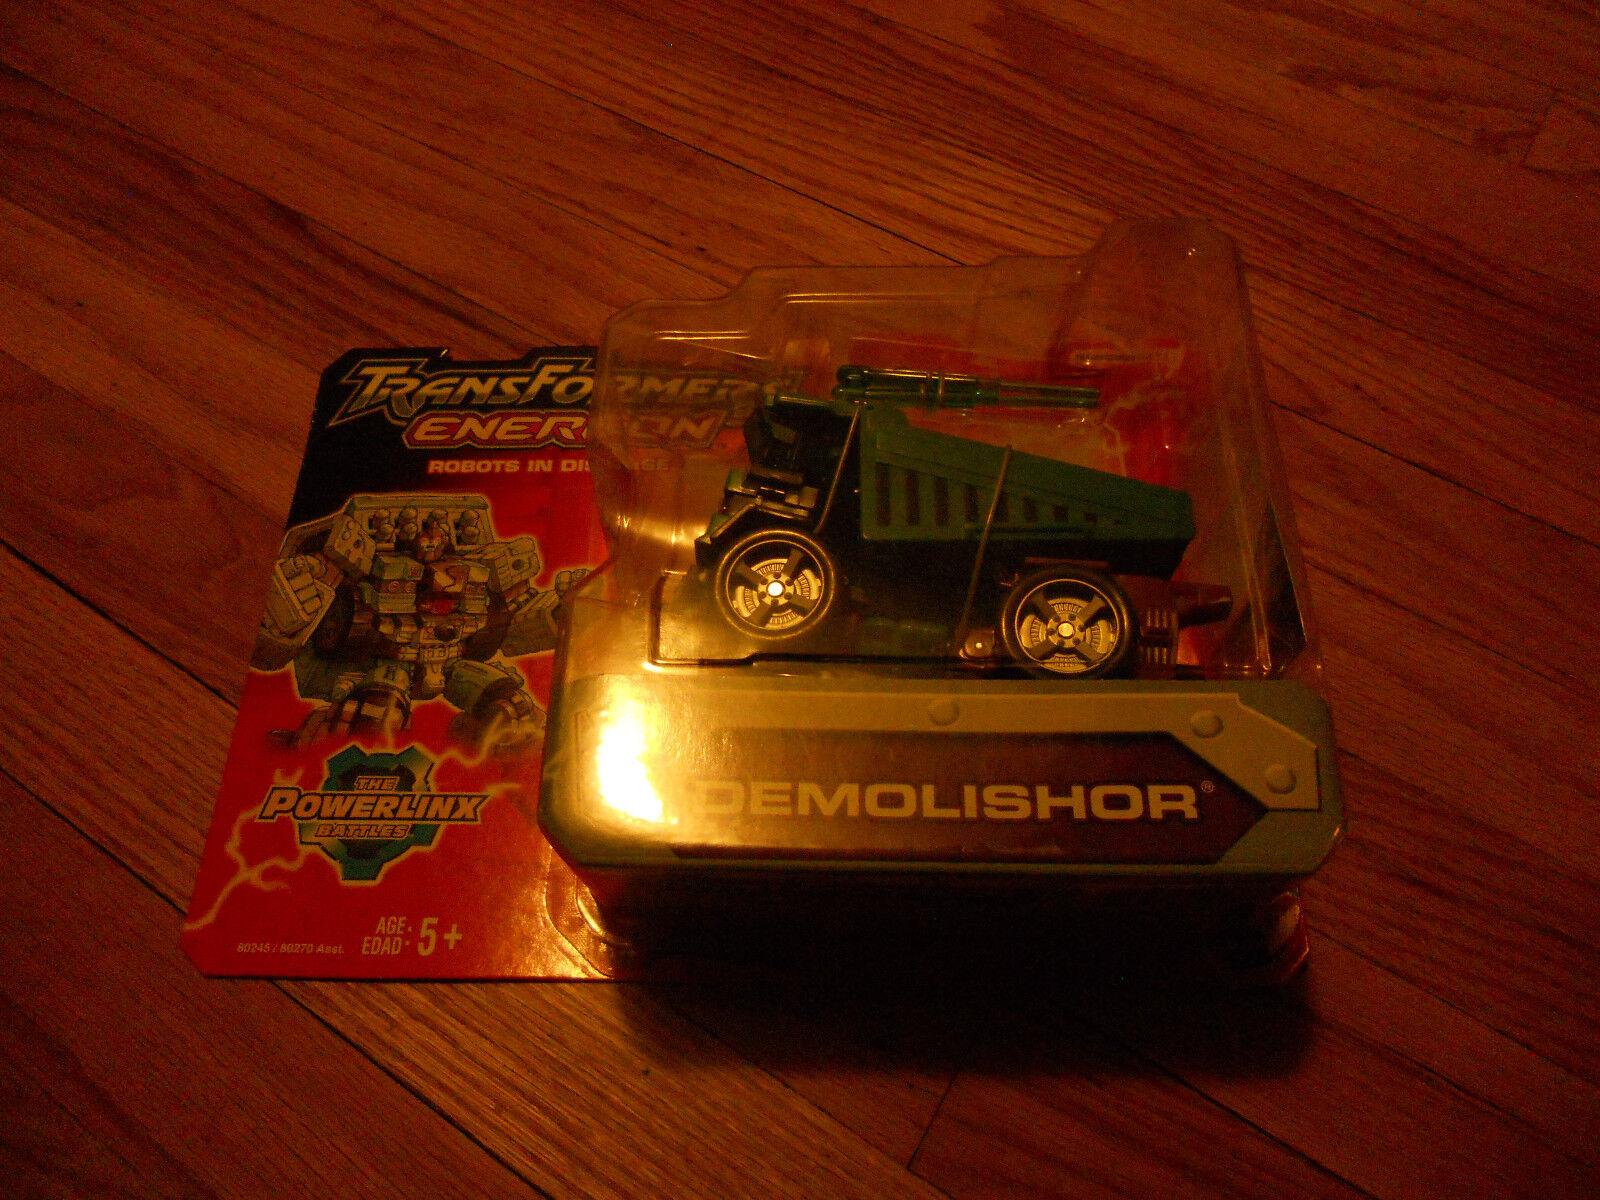 Hasbro Transformers Energon Demolishor Action Figure